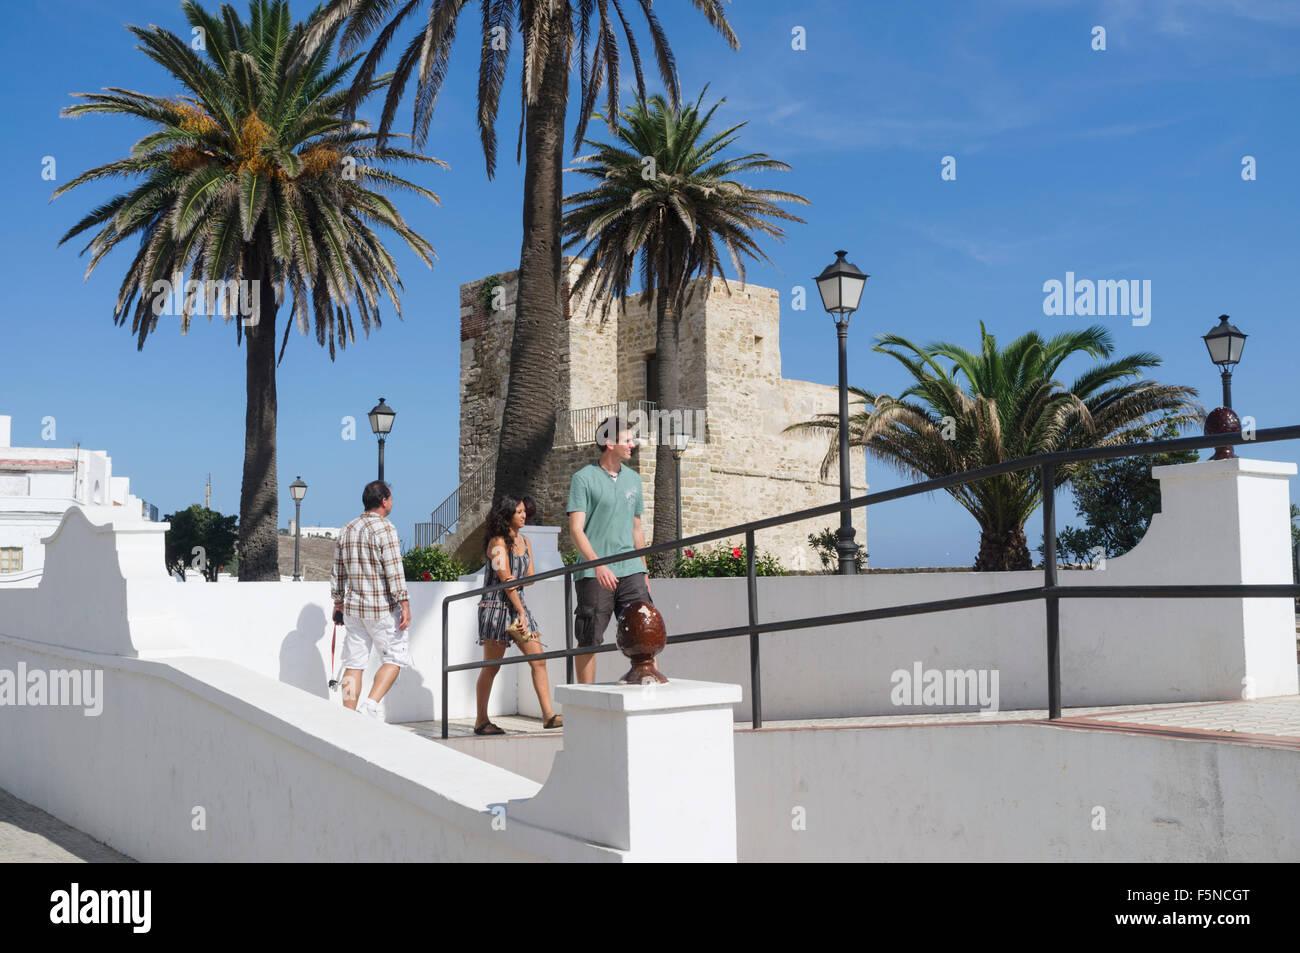 Miramar-Turm und Gärten in Tarifa Altstadt, Provinz Cadiz, Andalusien, Spanien Stockfoto